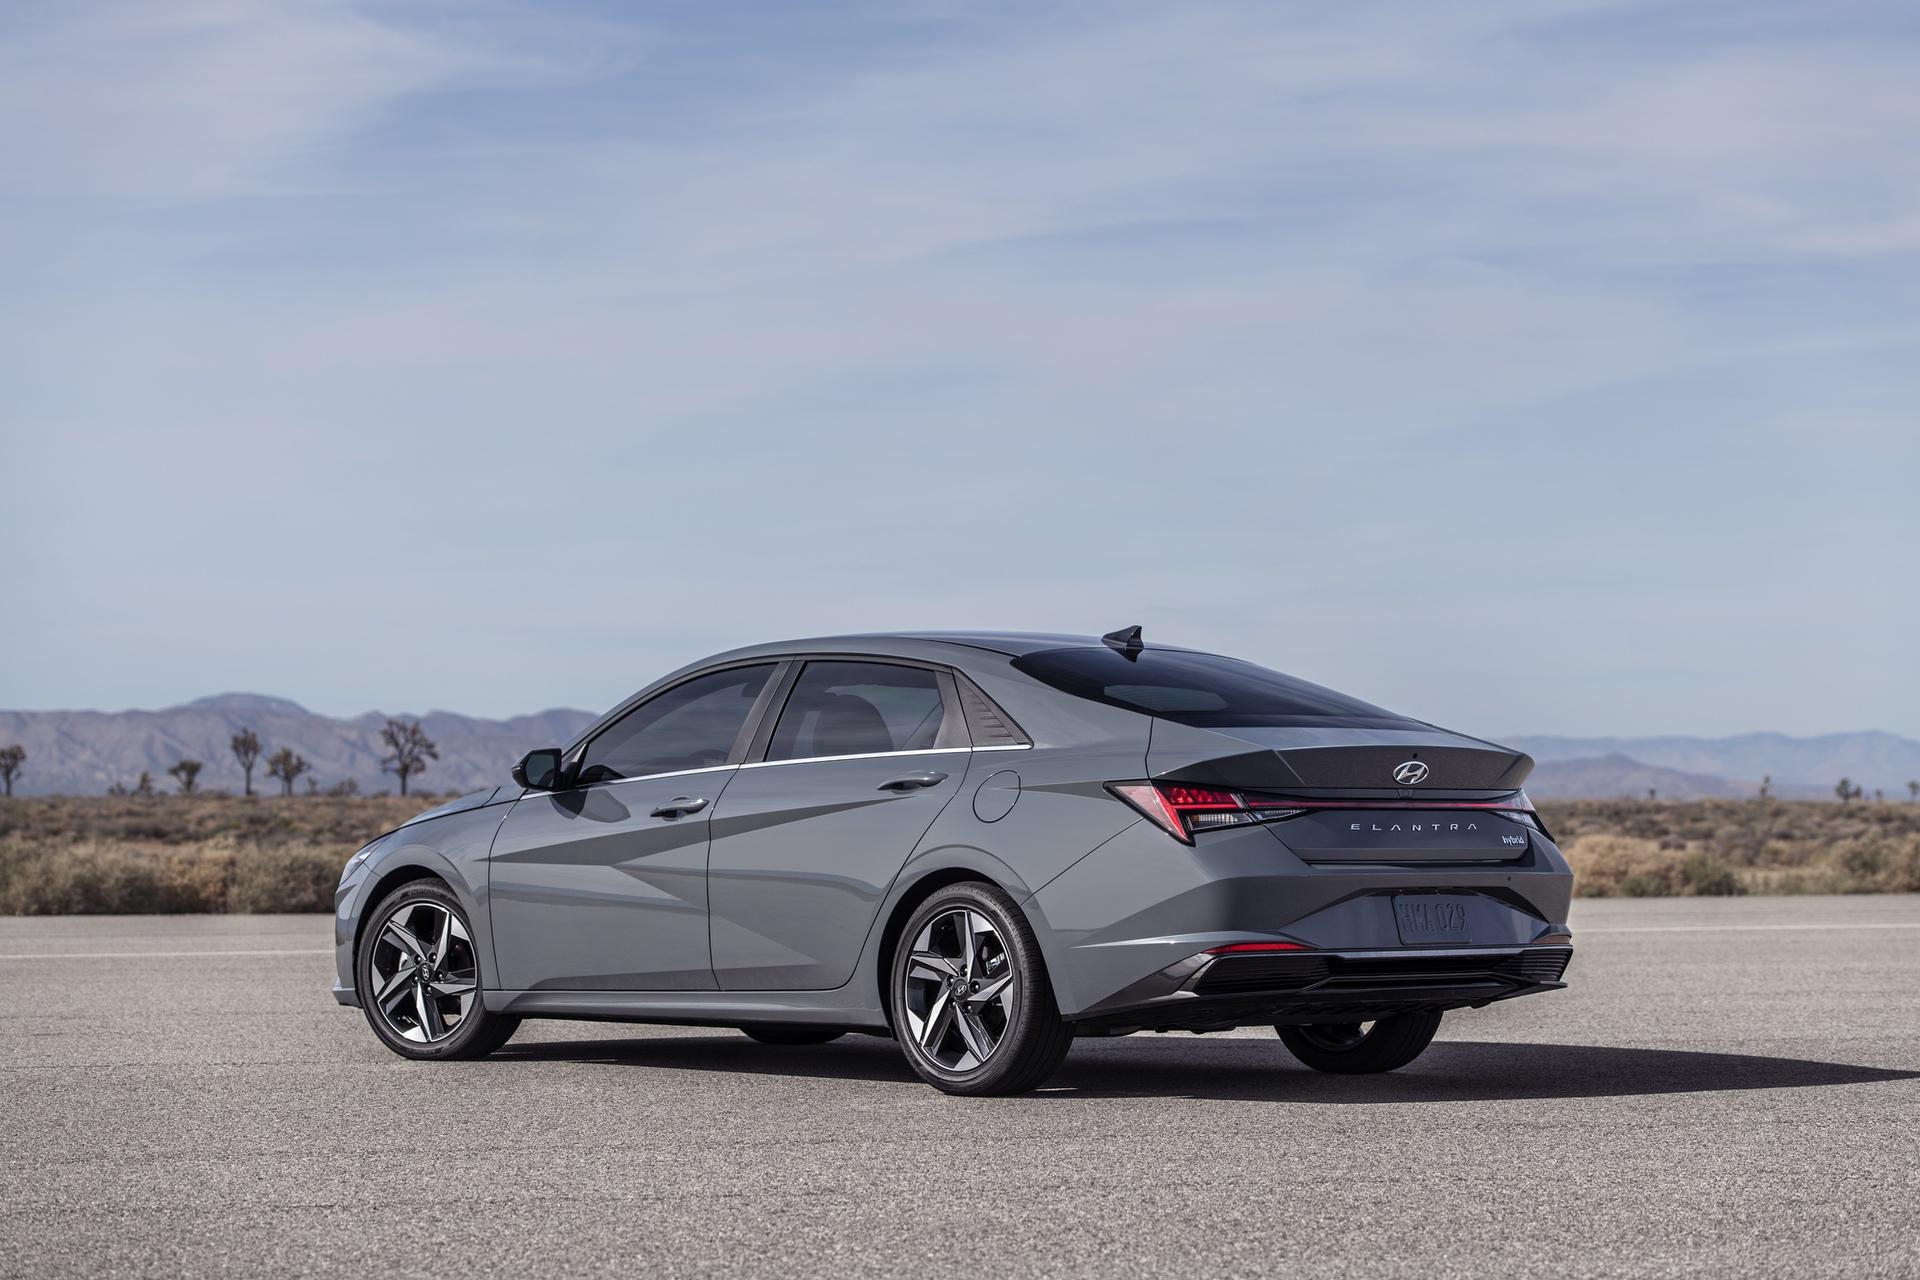 2021_Hyundai_Elantra_Hybrid_0008